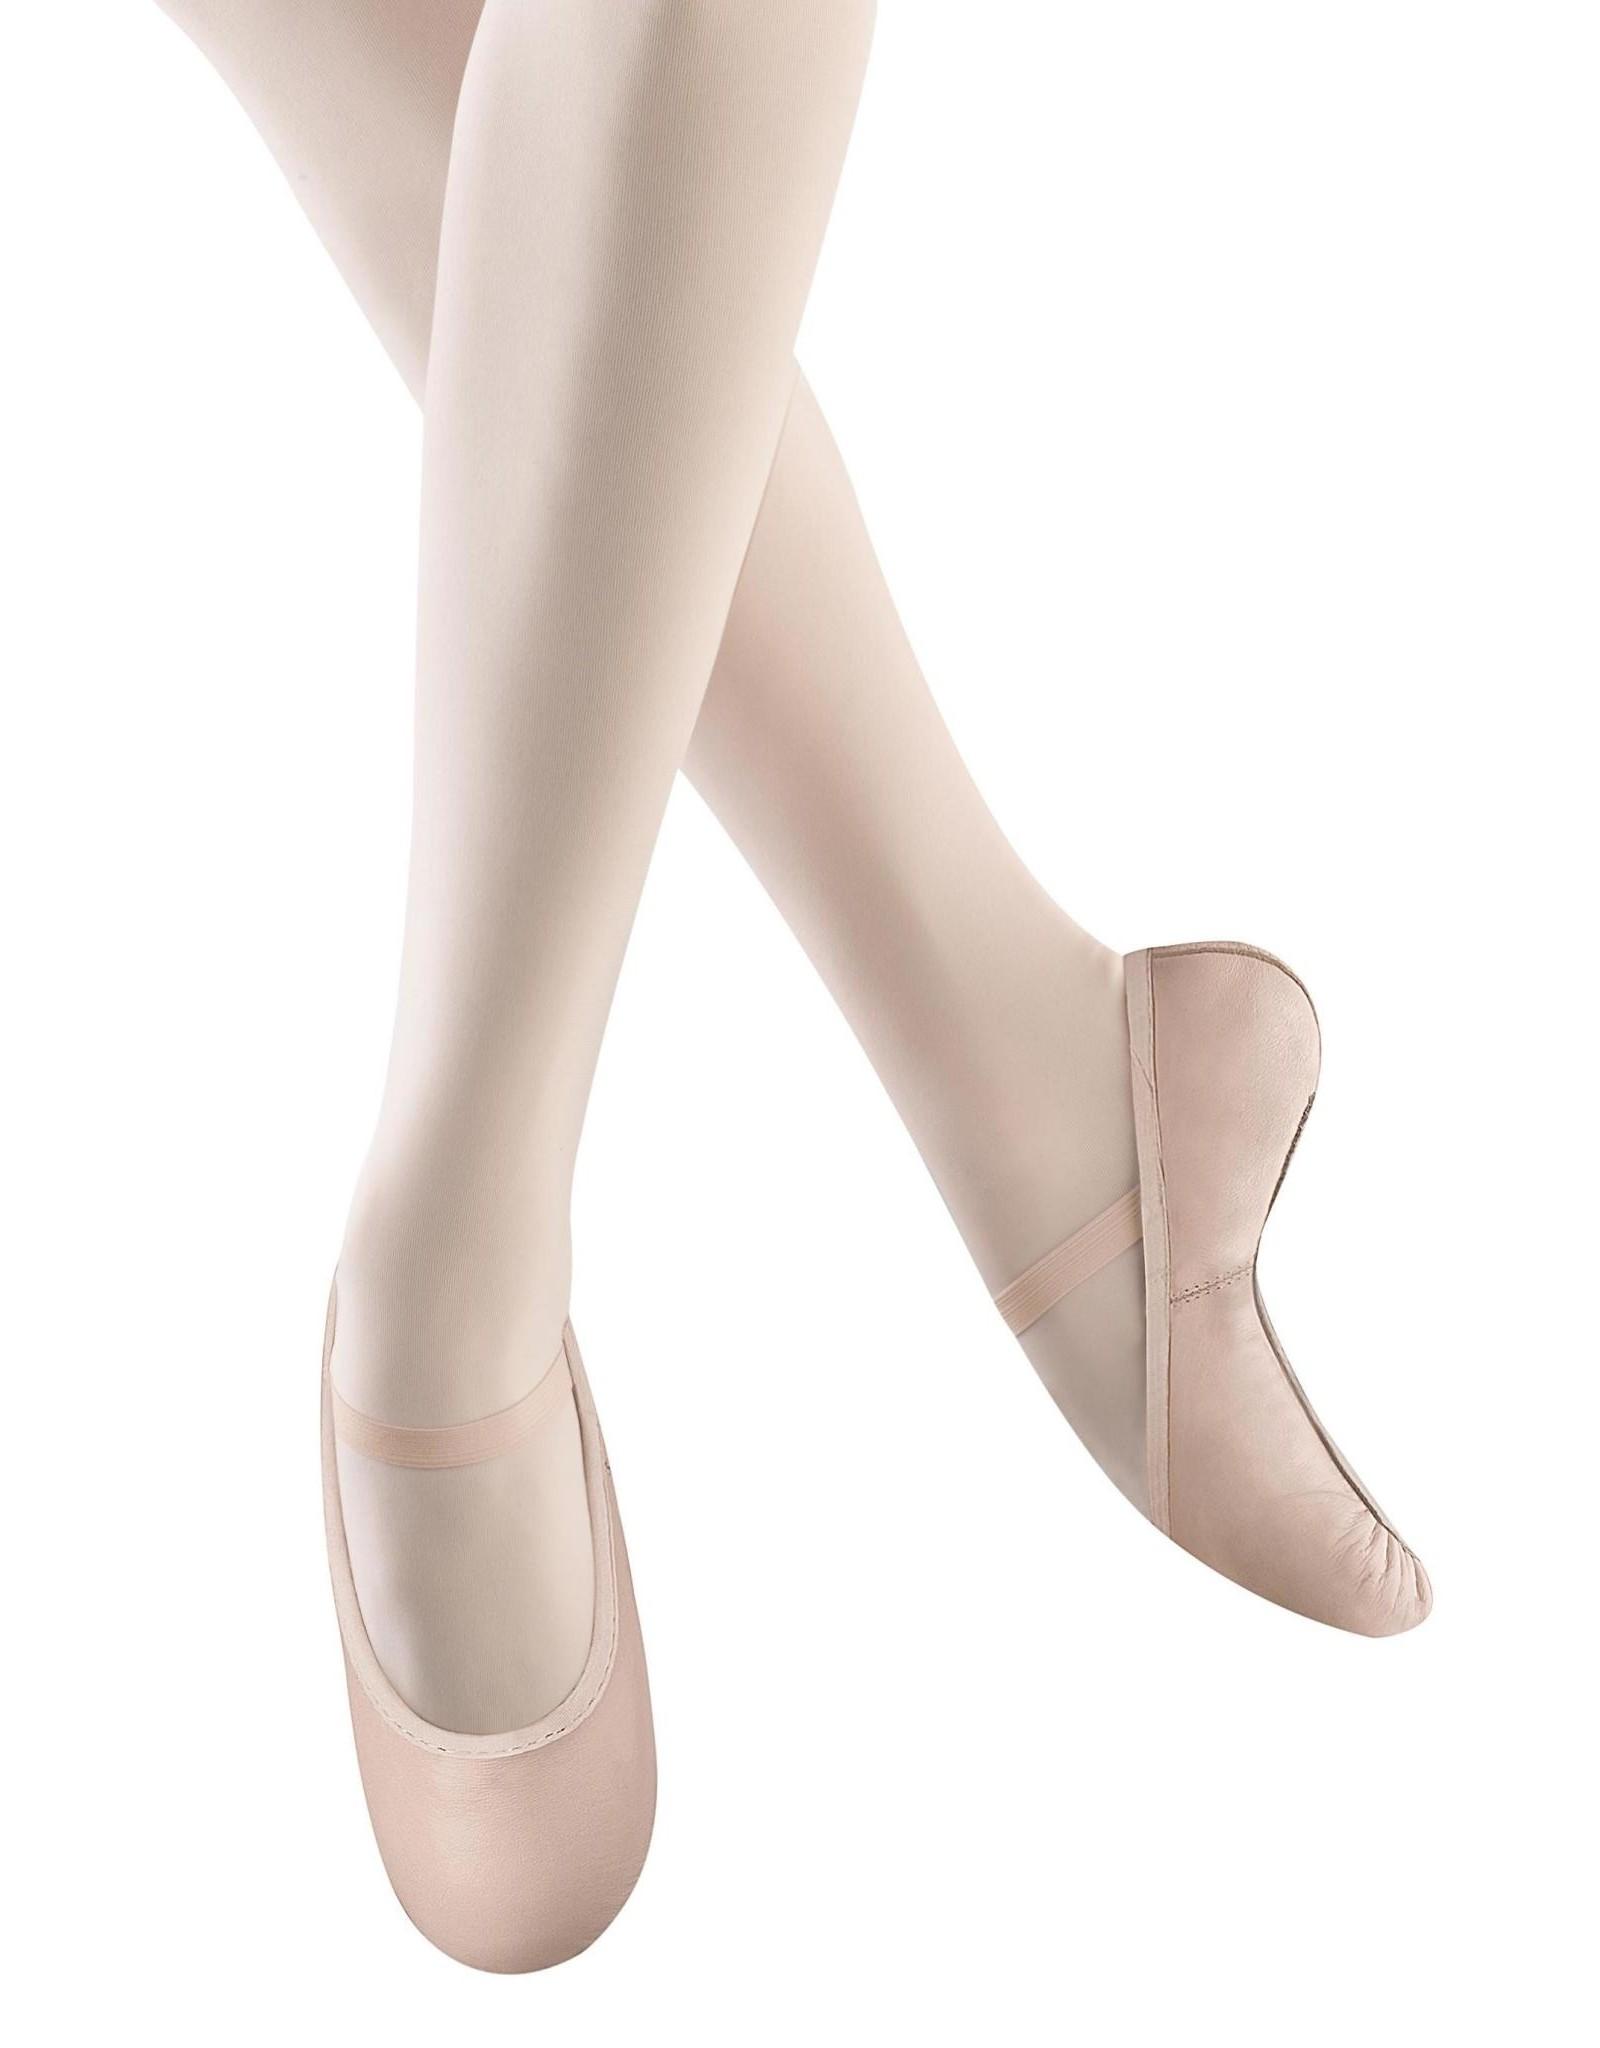 Bloch / Mirella Belle Ballet Shoe - Toddlers (227T)